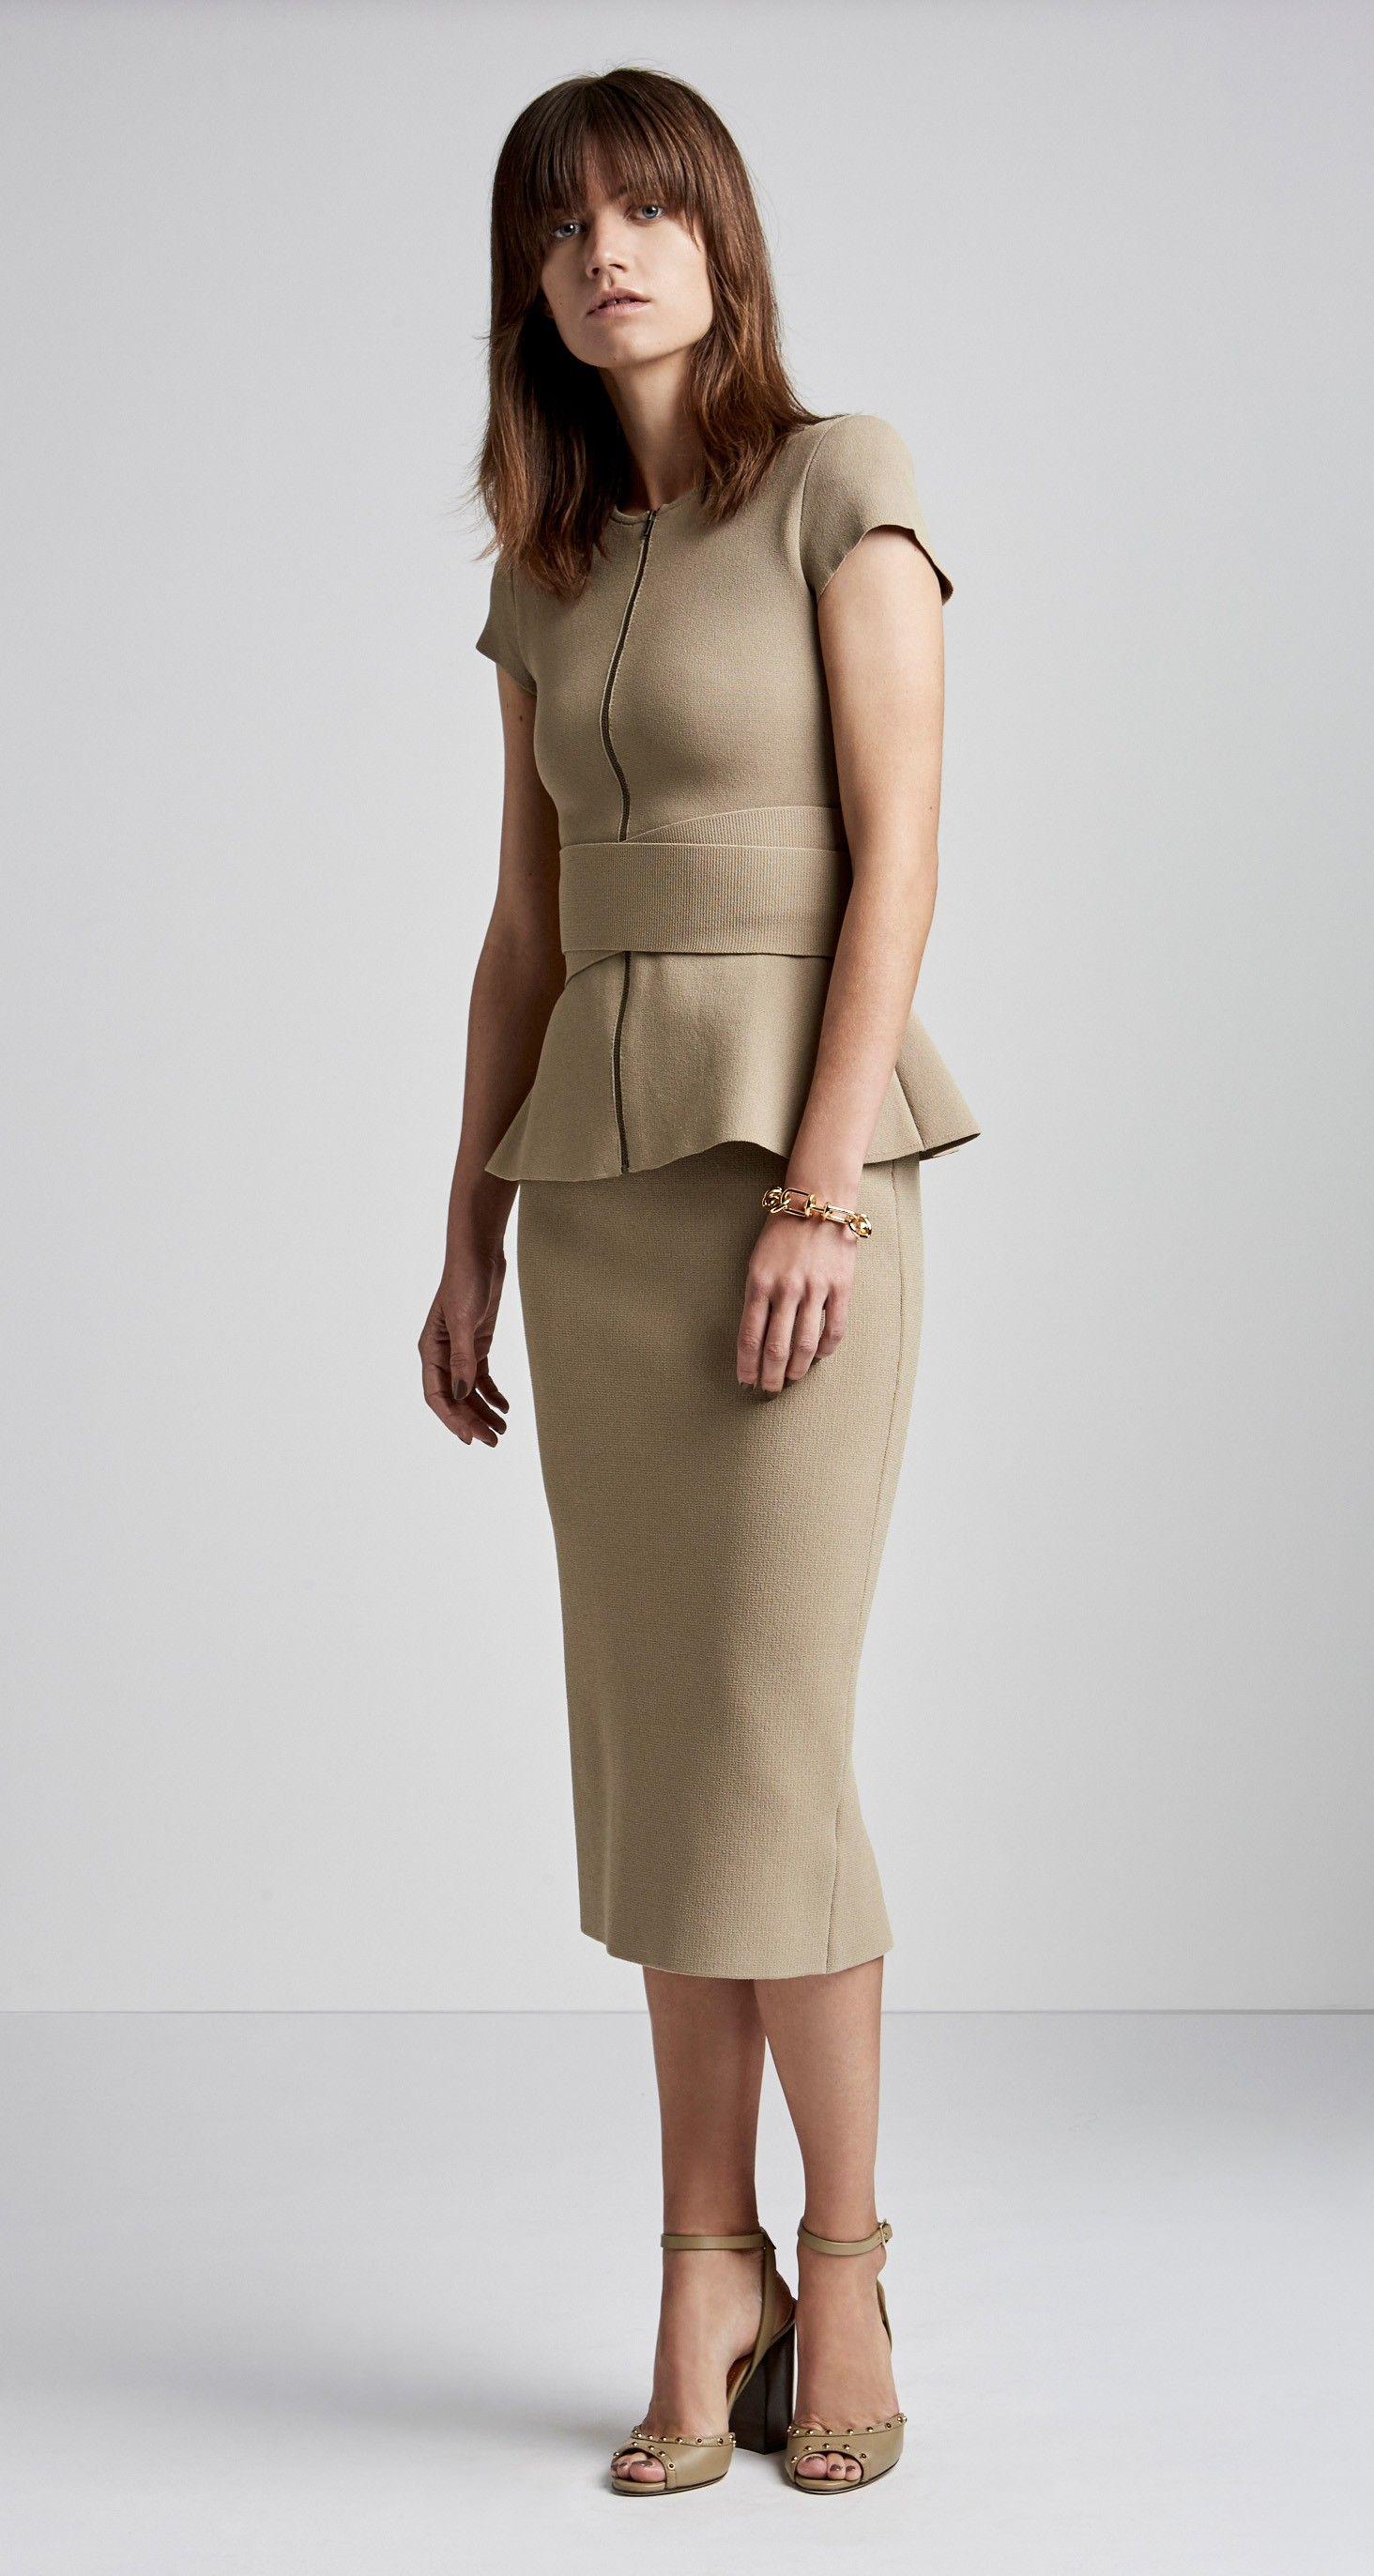 409c0c534f90 CREPE KNIT SLIT BACK SKIRT - Skirts - Sale | SCANLAN THEODORE ...